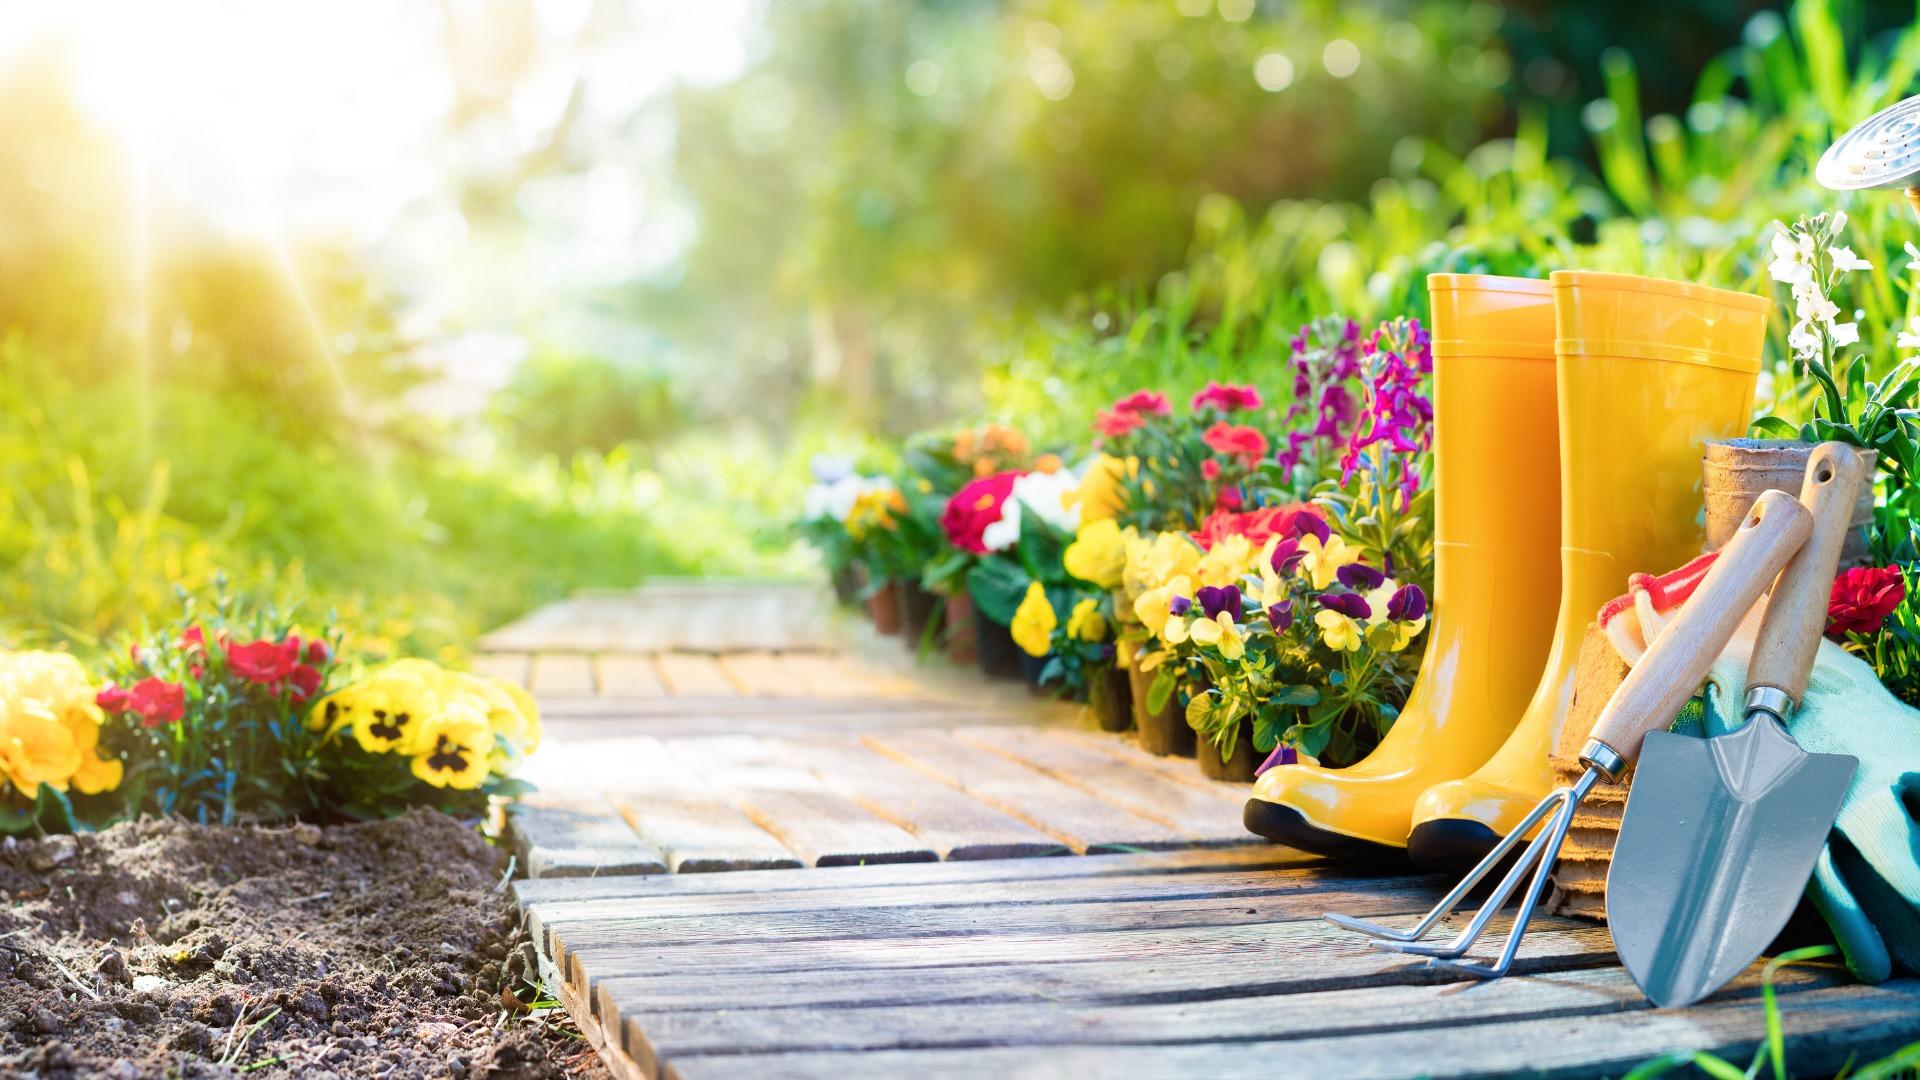 Top Gardening Tips For Landlords